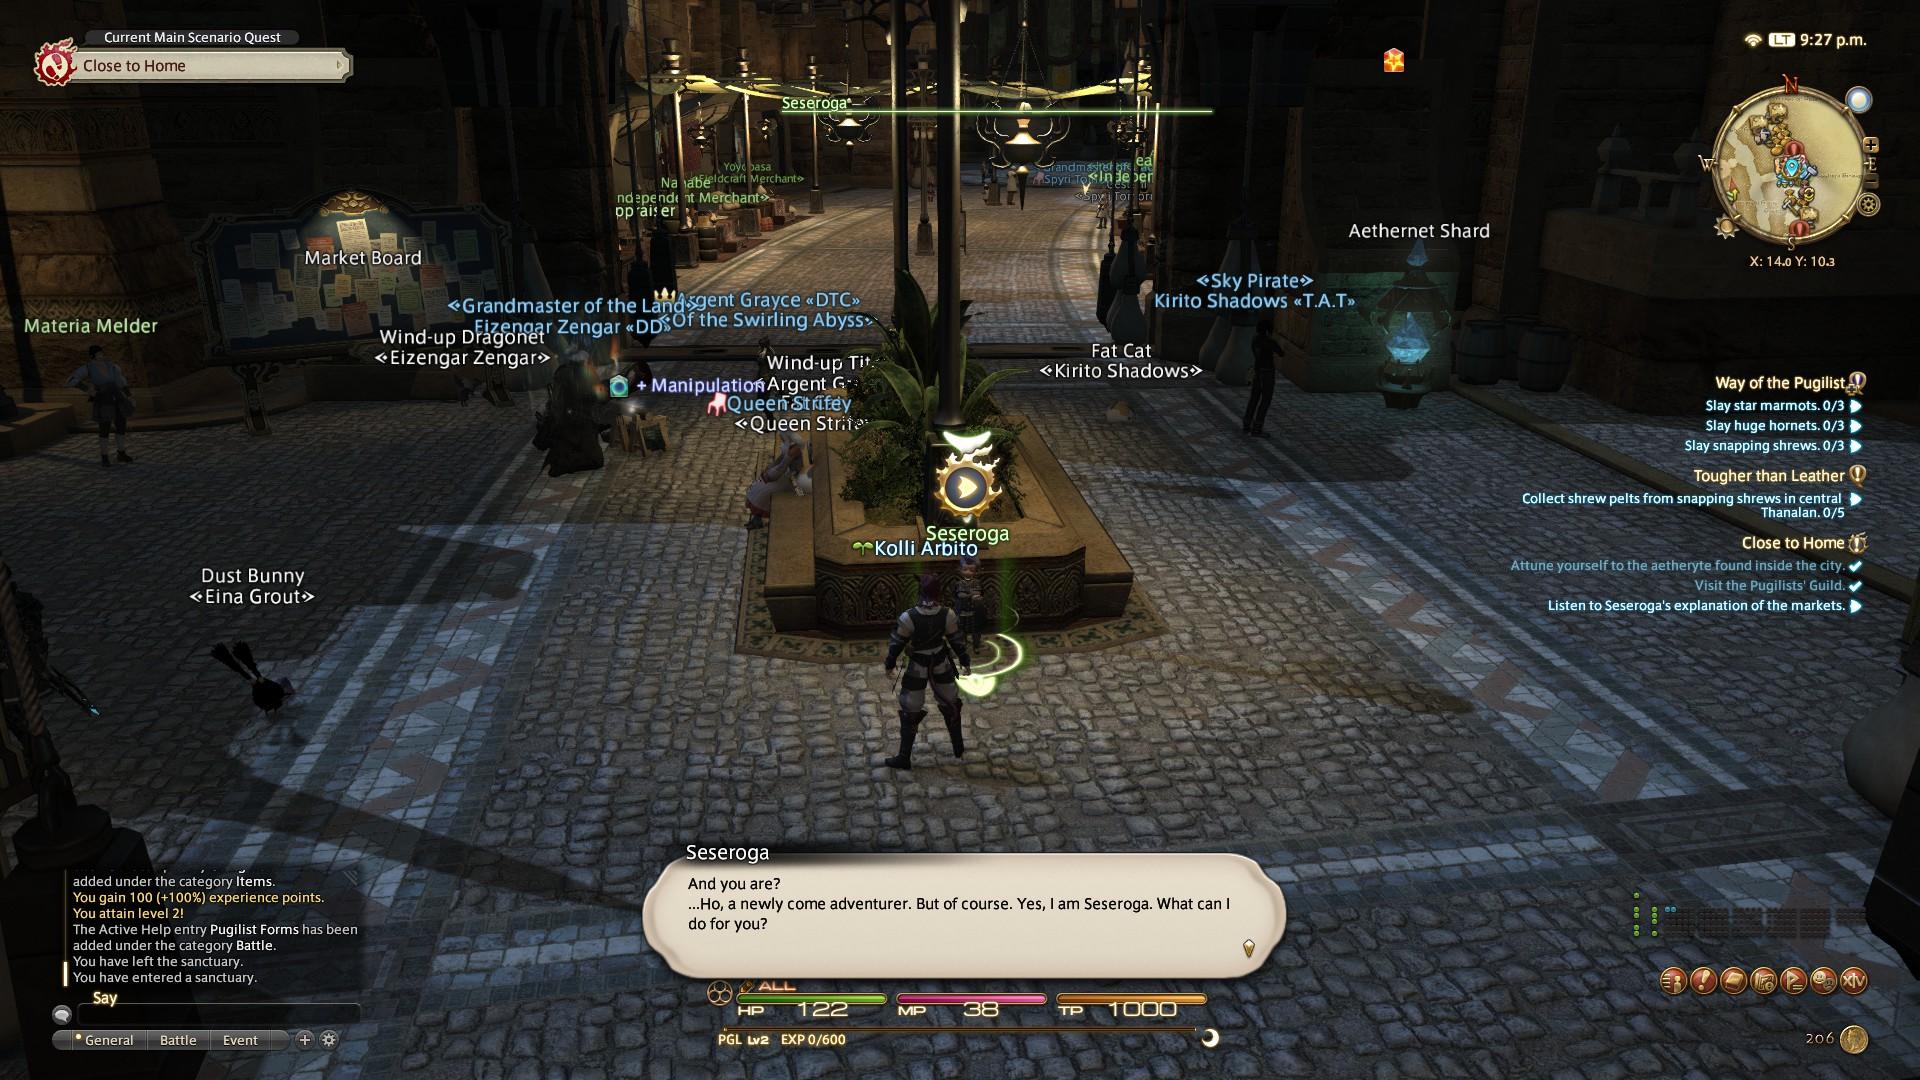 Video Game Review: Final Fantasy XIV: A Realm Reborn (Trial